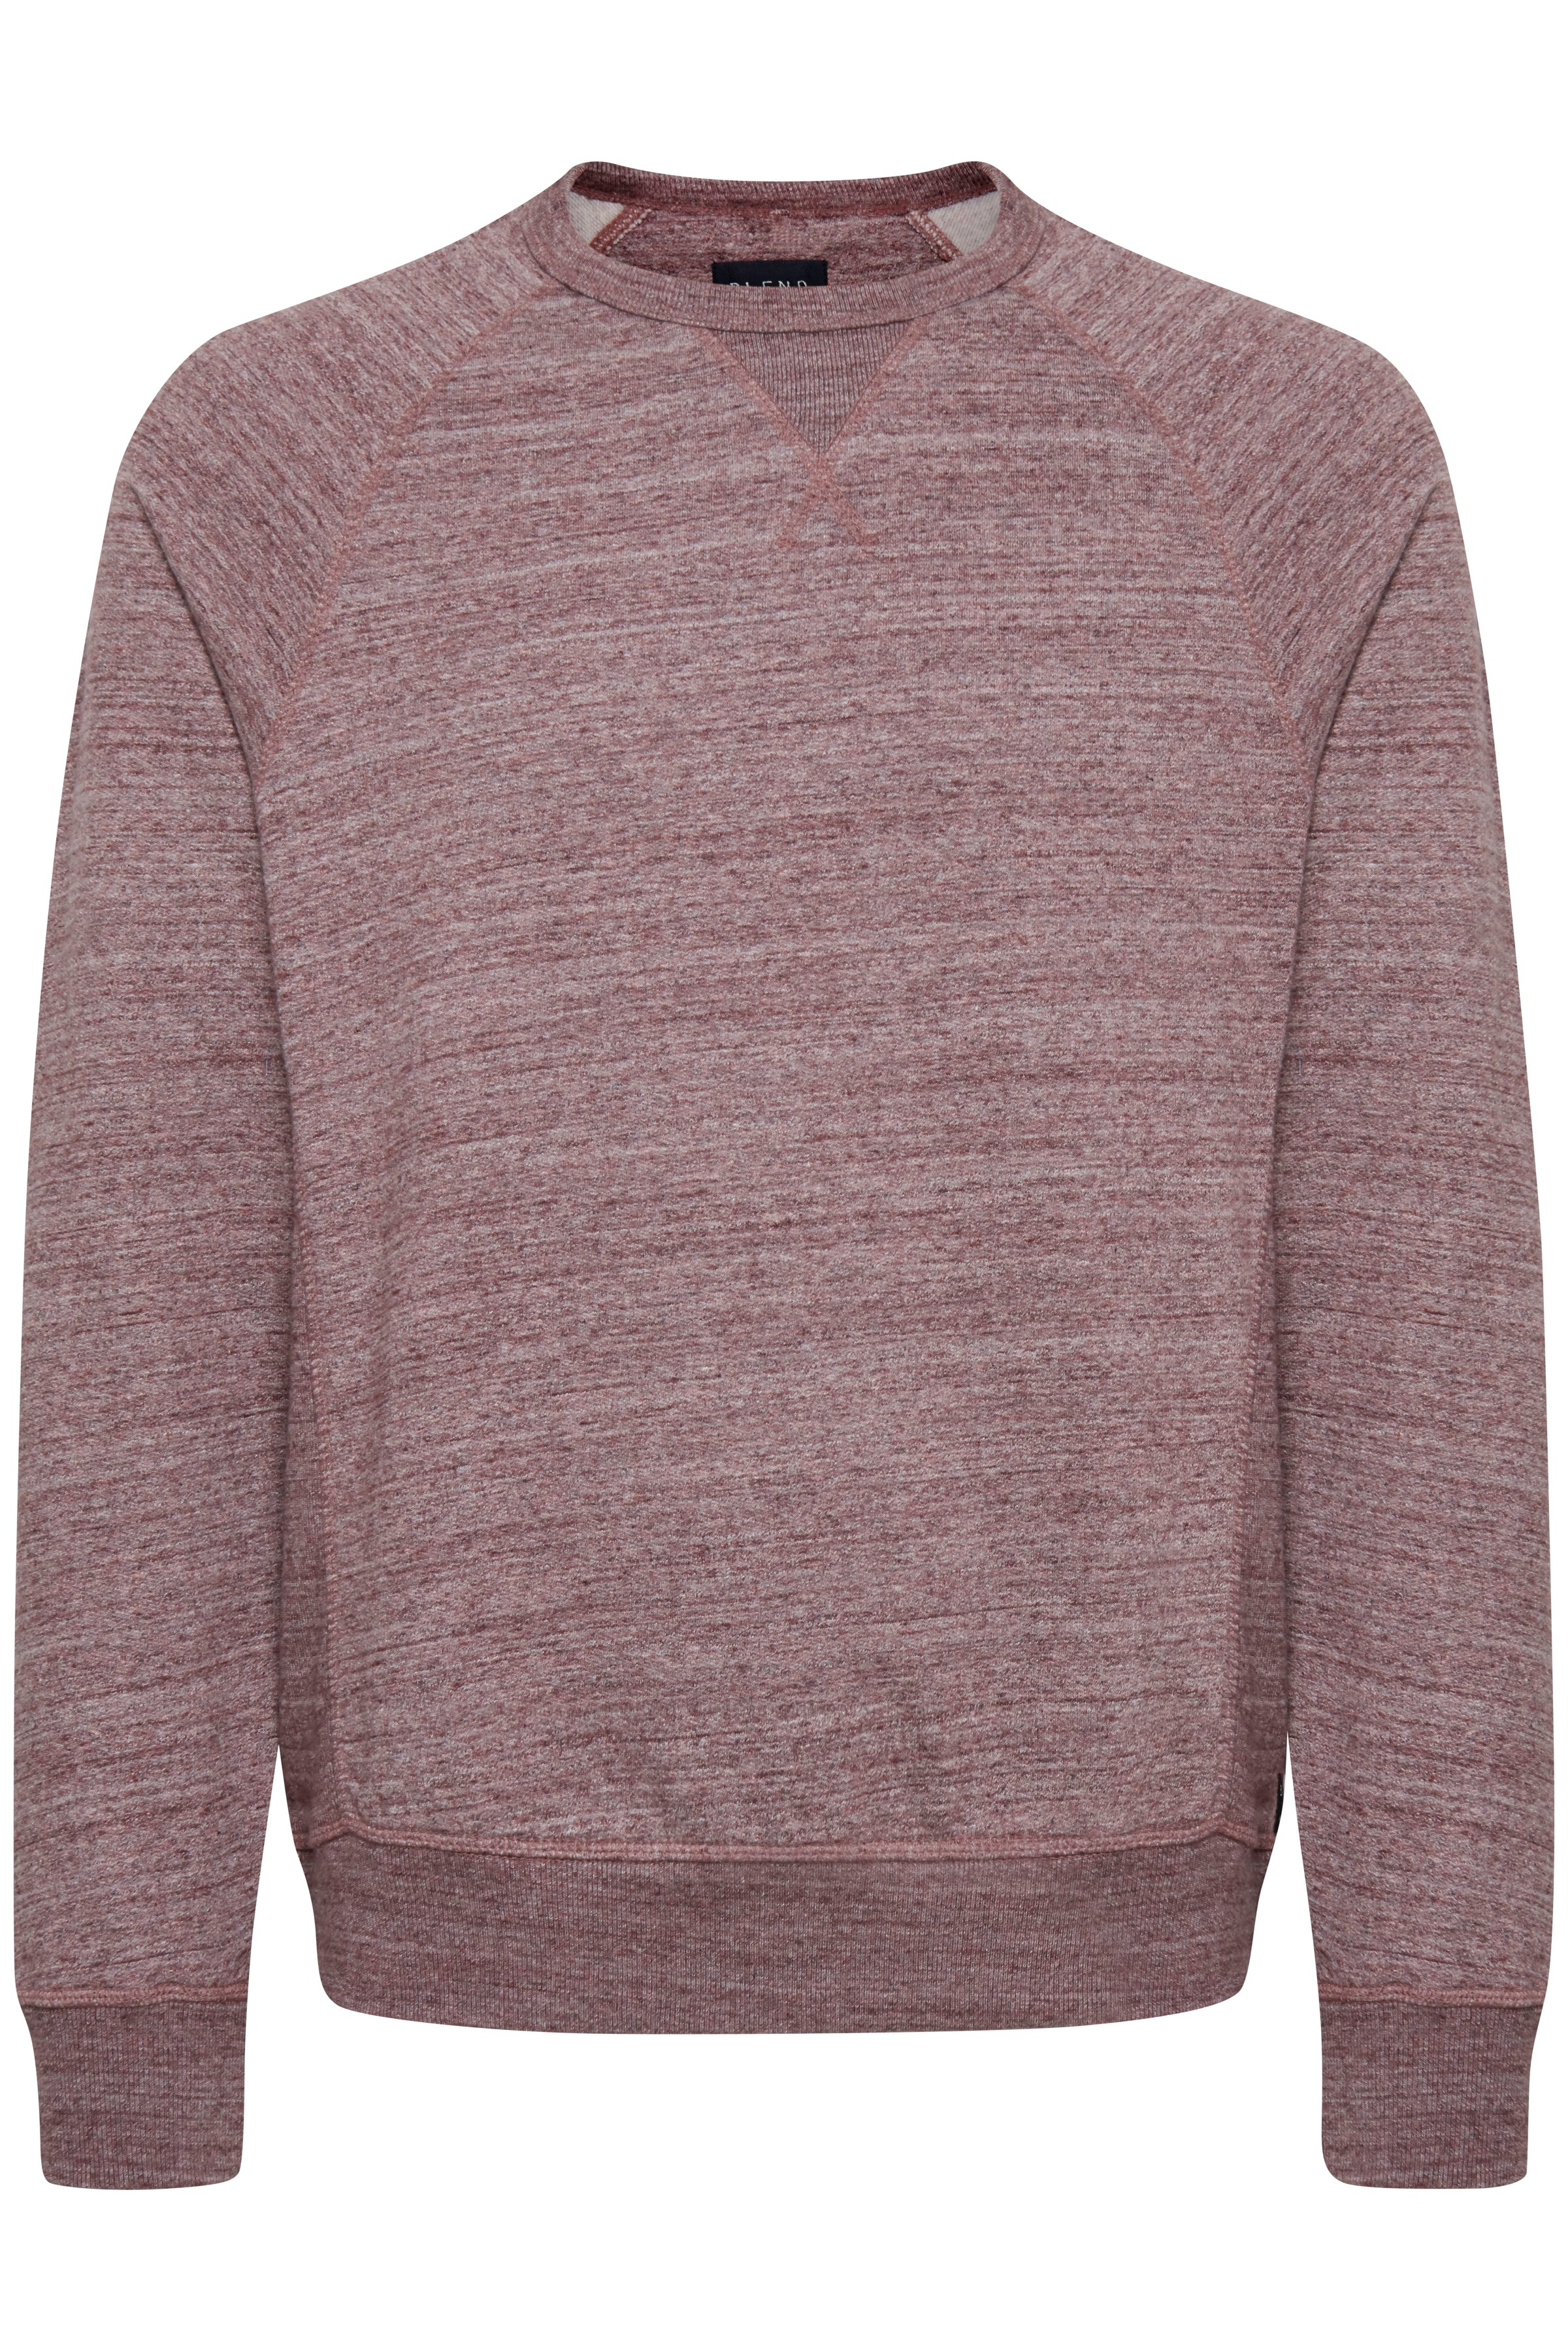 Bordeaux Sweatshirt fra Blend He – Køb Bordeaux Sweatshirt fra str. S-3XL her